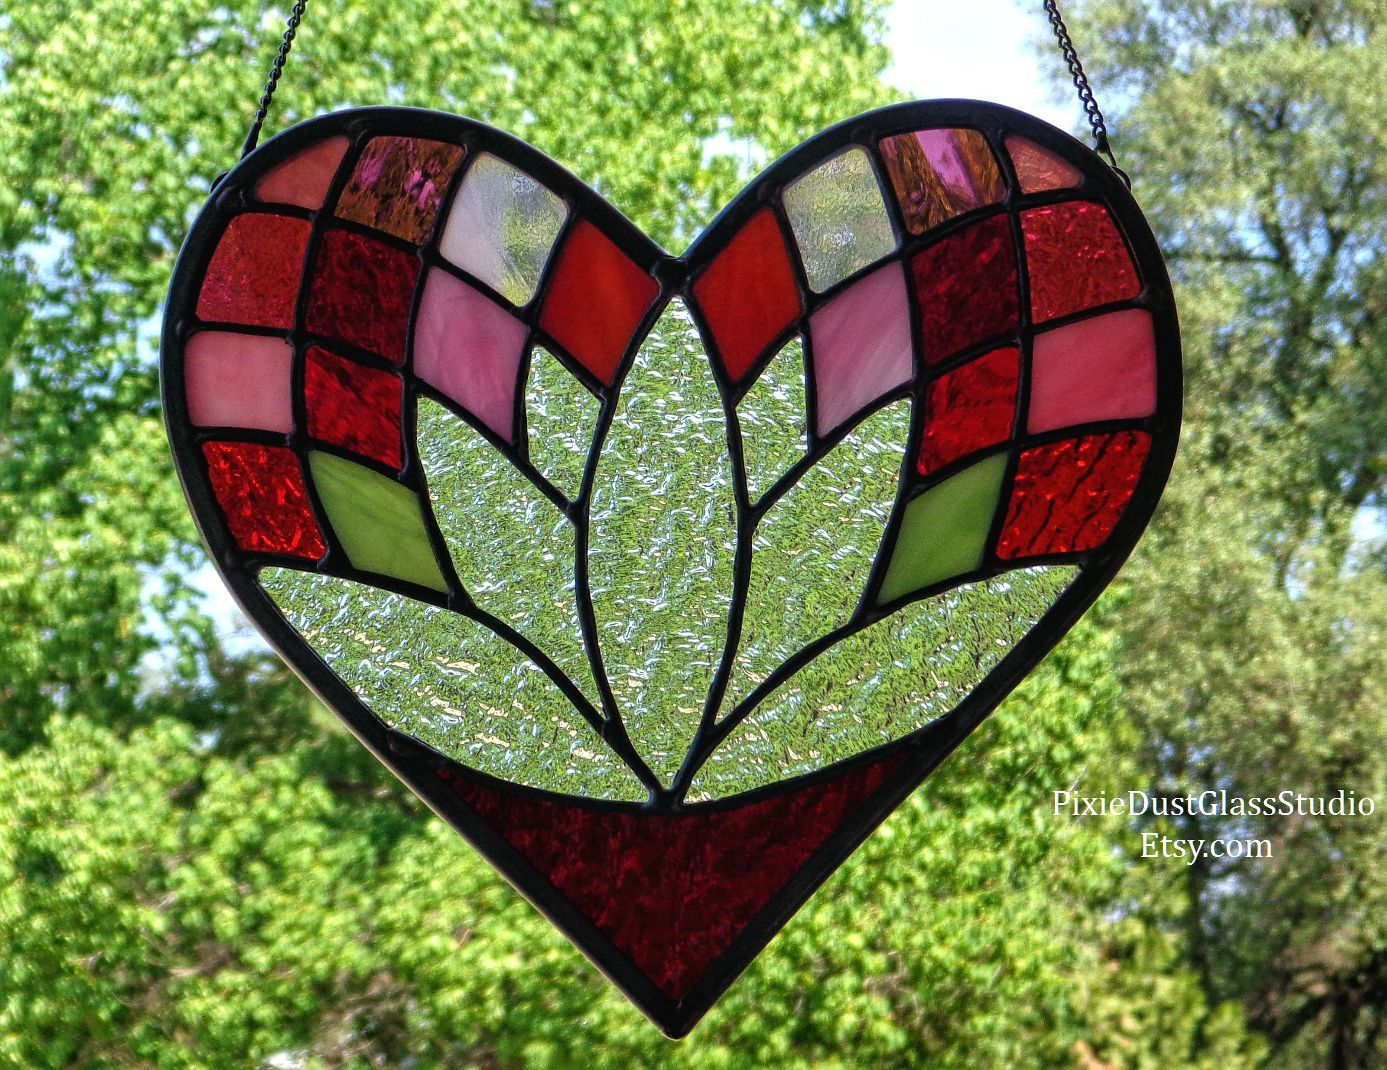 Stained Glass Suncatcher Heart Shaped Lotus Flower Window Hanging Anniversary Gift Valentine Wedding Meditation